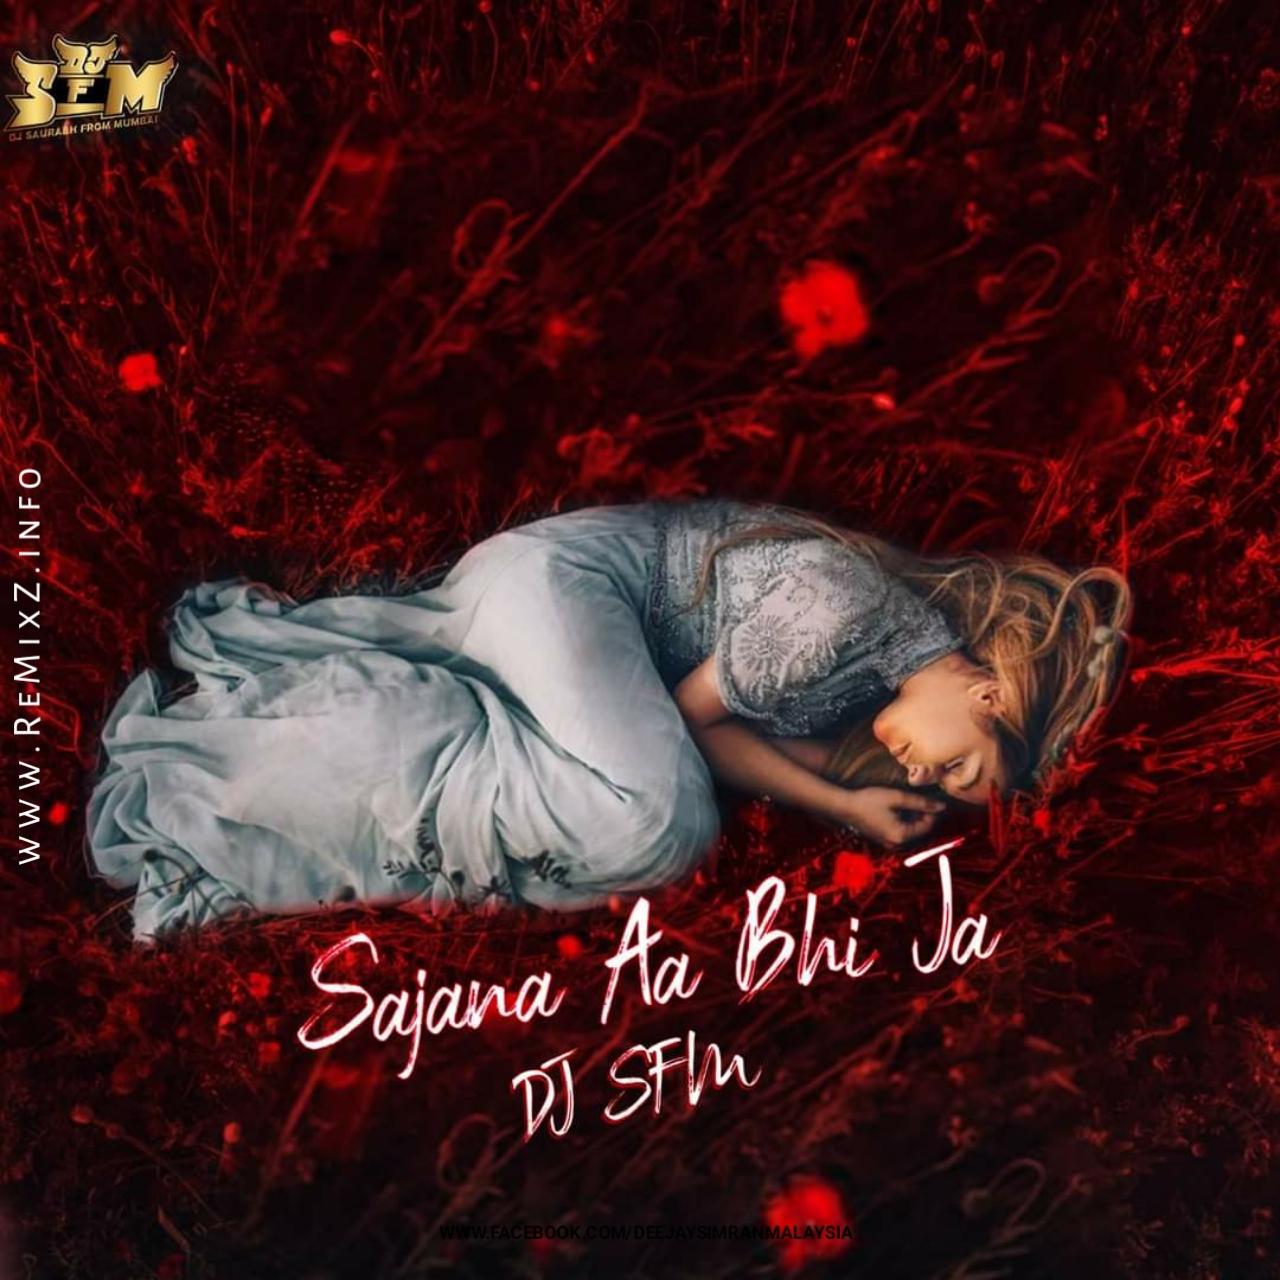 sajna-aa-bhi-ja-dj-sfm-remix.jpg